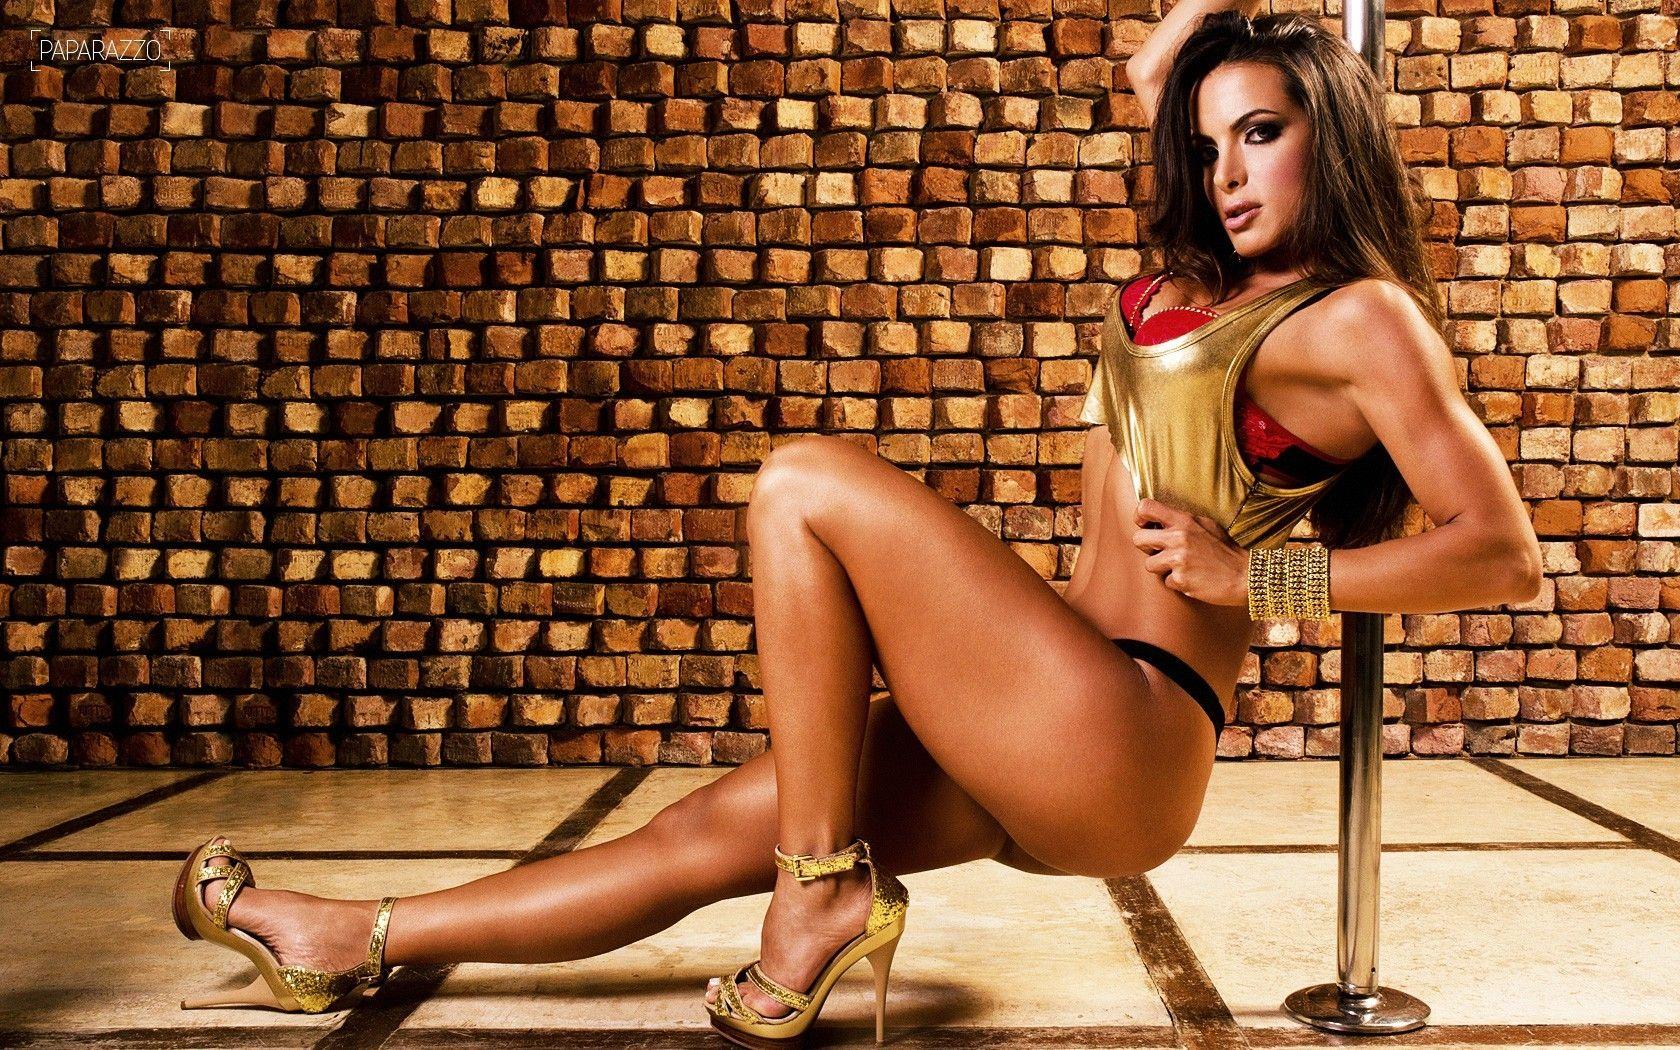 Ana Hickmann Nua Porno carla prata s feet | free hot nude porn pic gallery